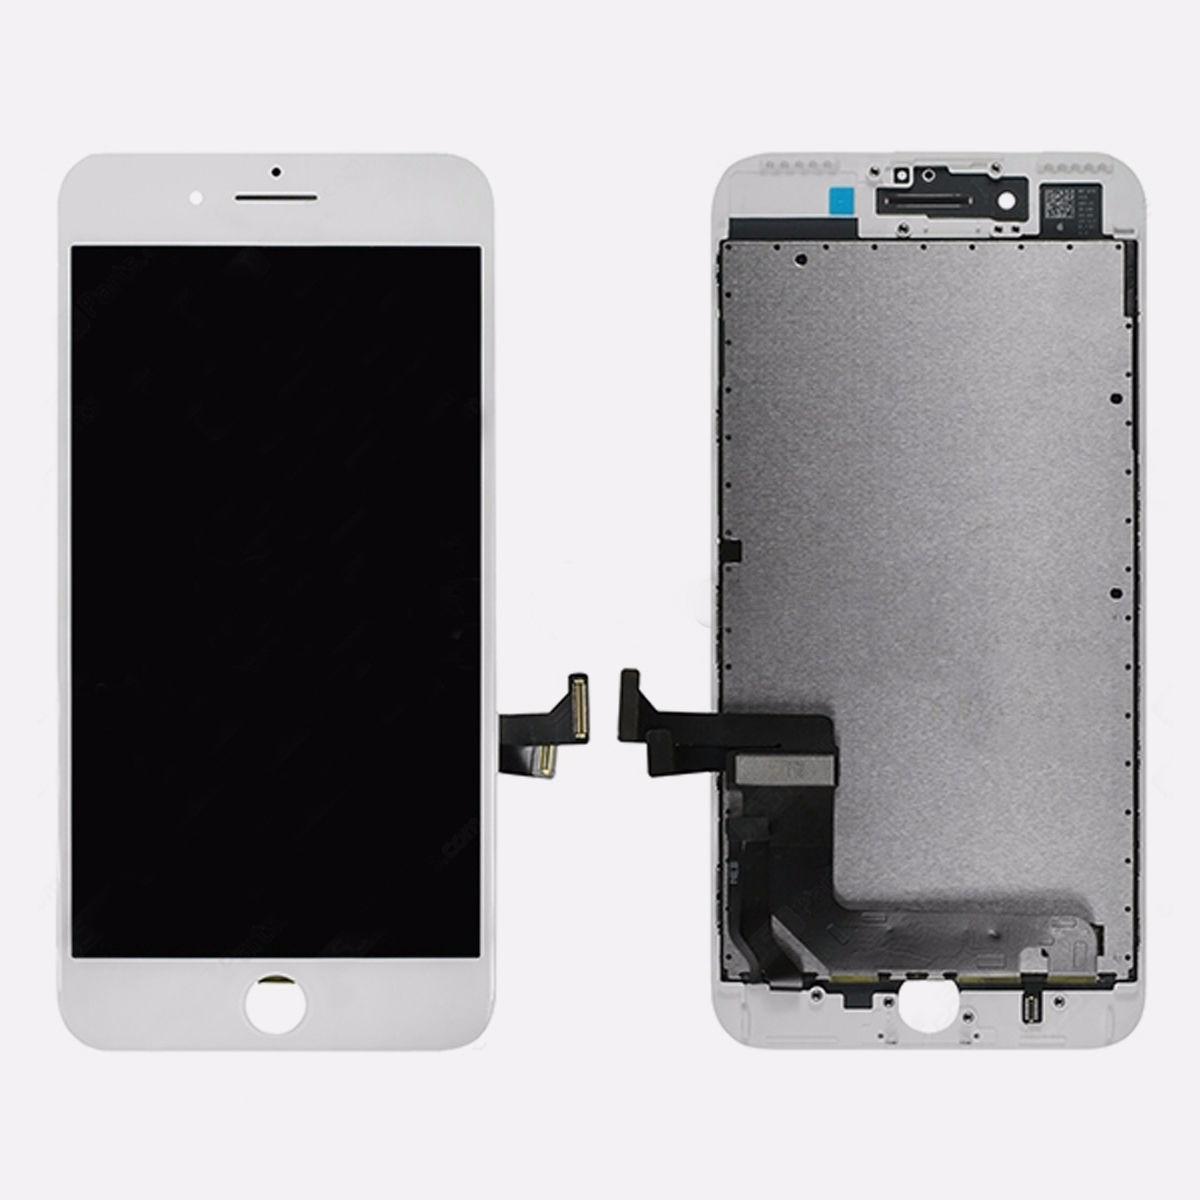 b1a521f877e pantalla modulo display original iphone 7 plus touch gtia. Cargando zoom.